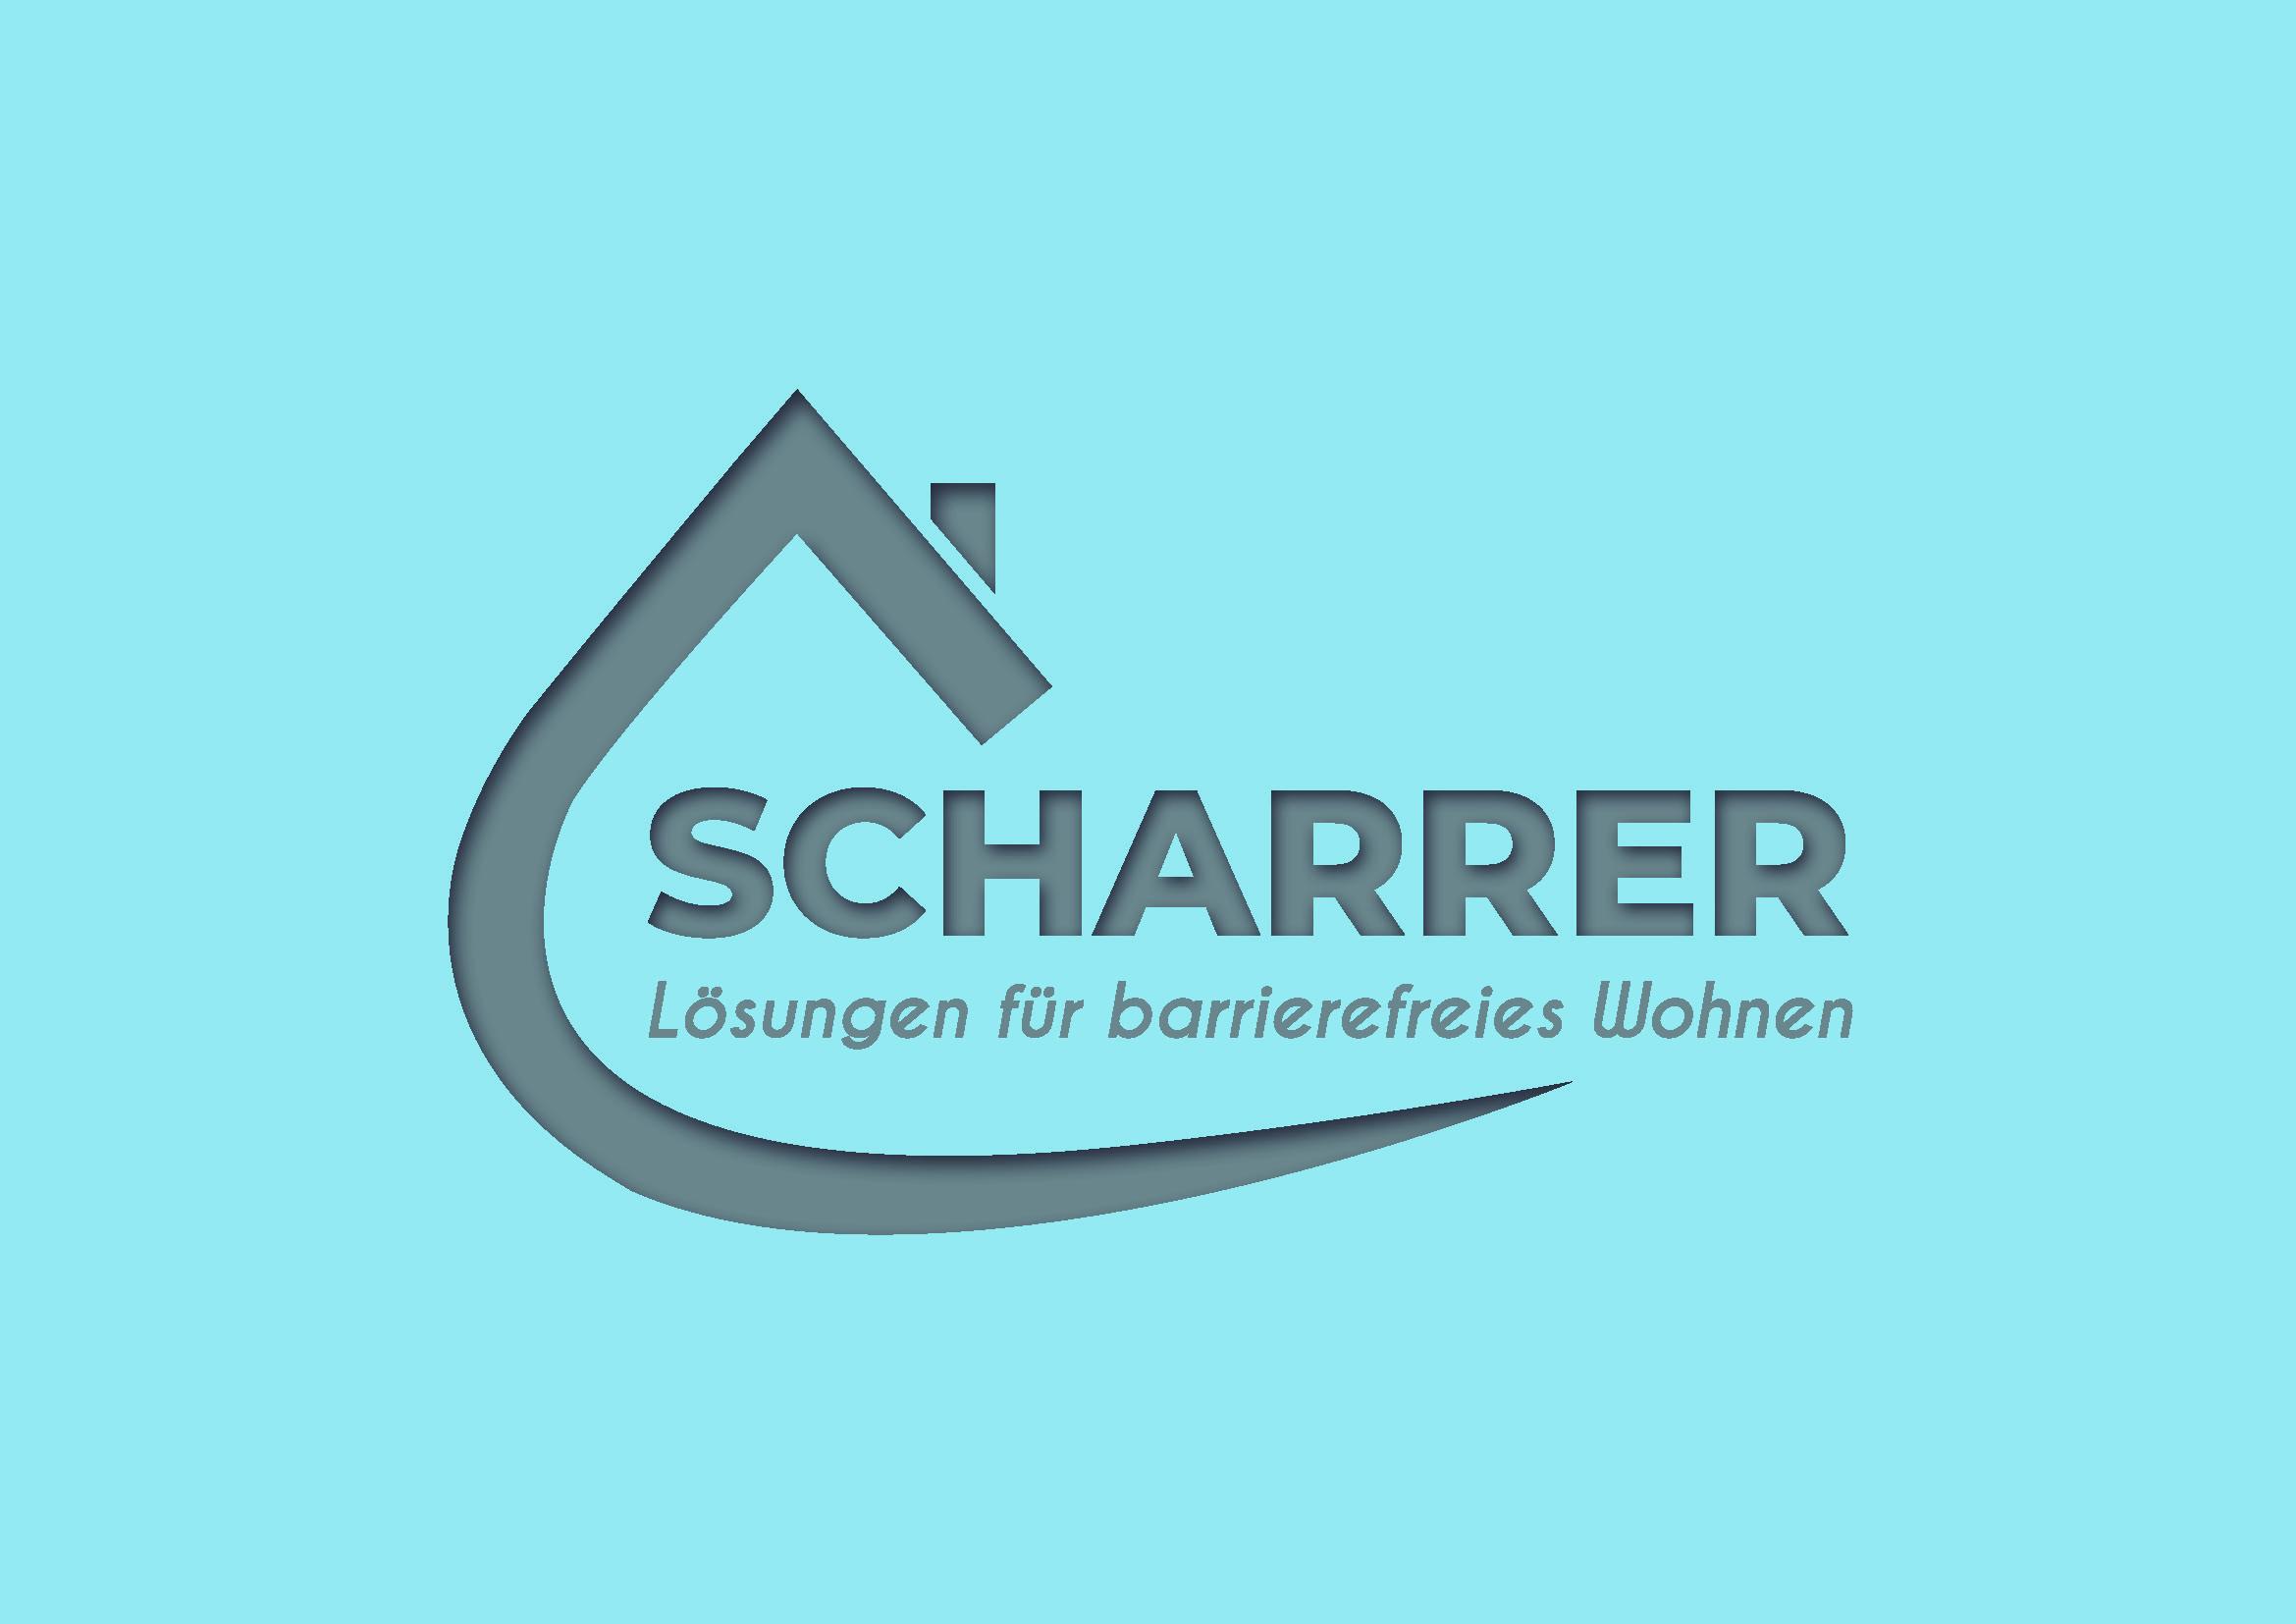 Scharrer LBW GmbH